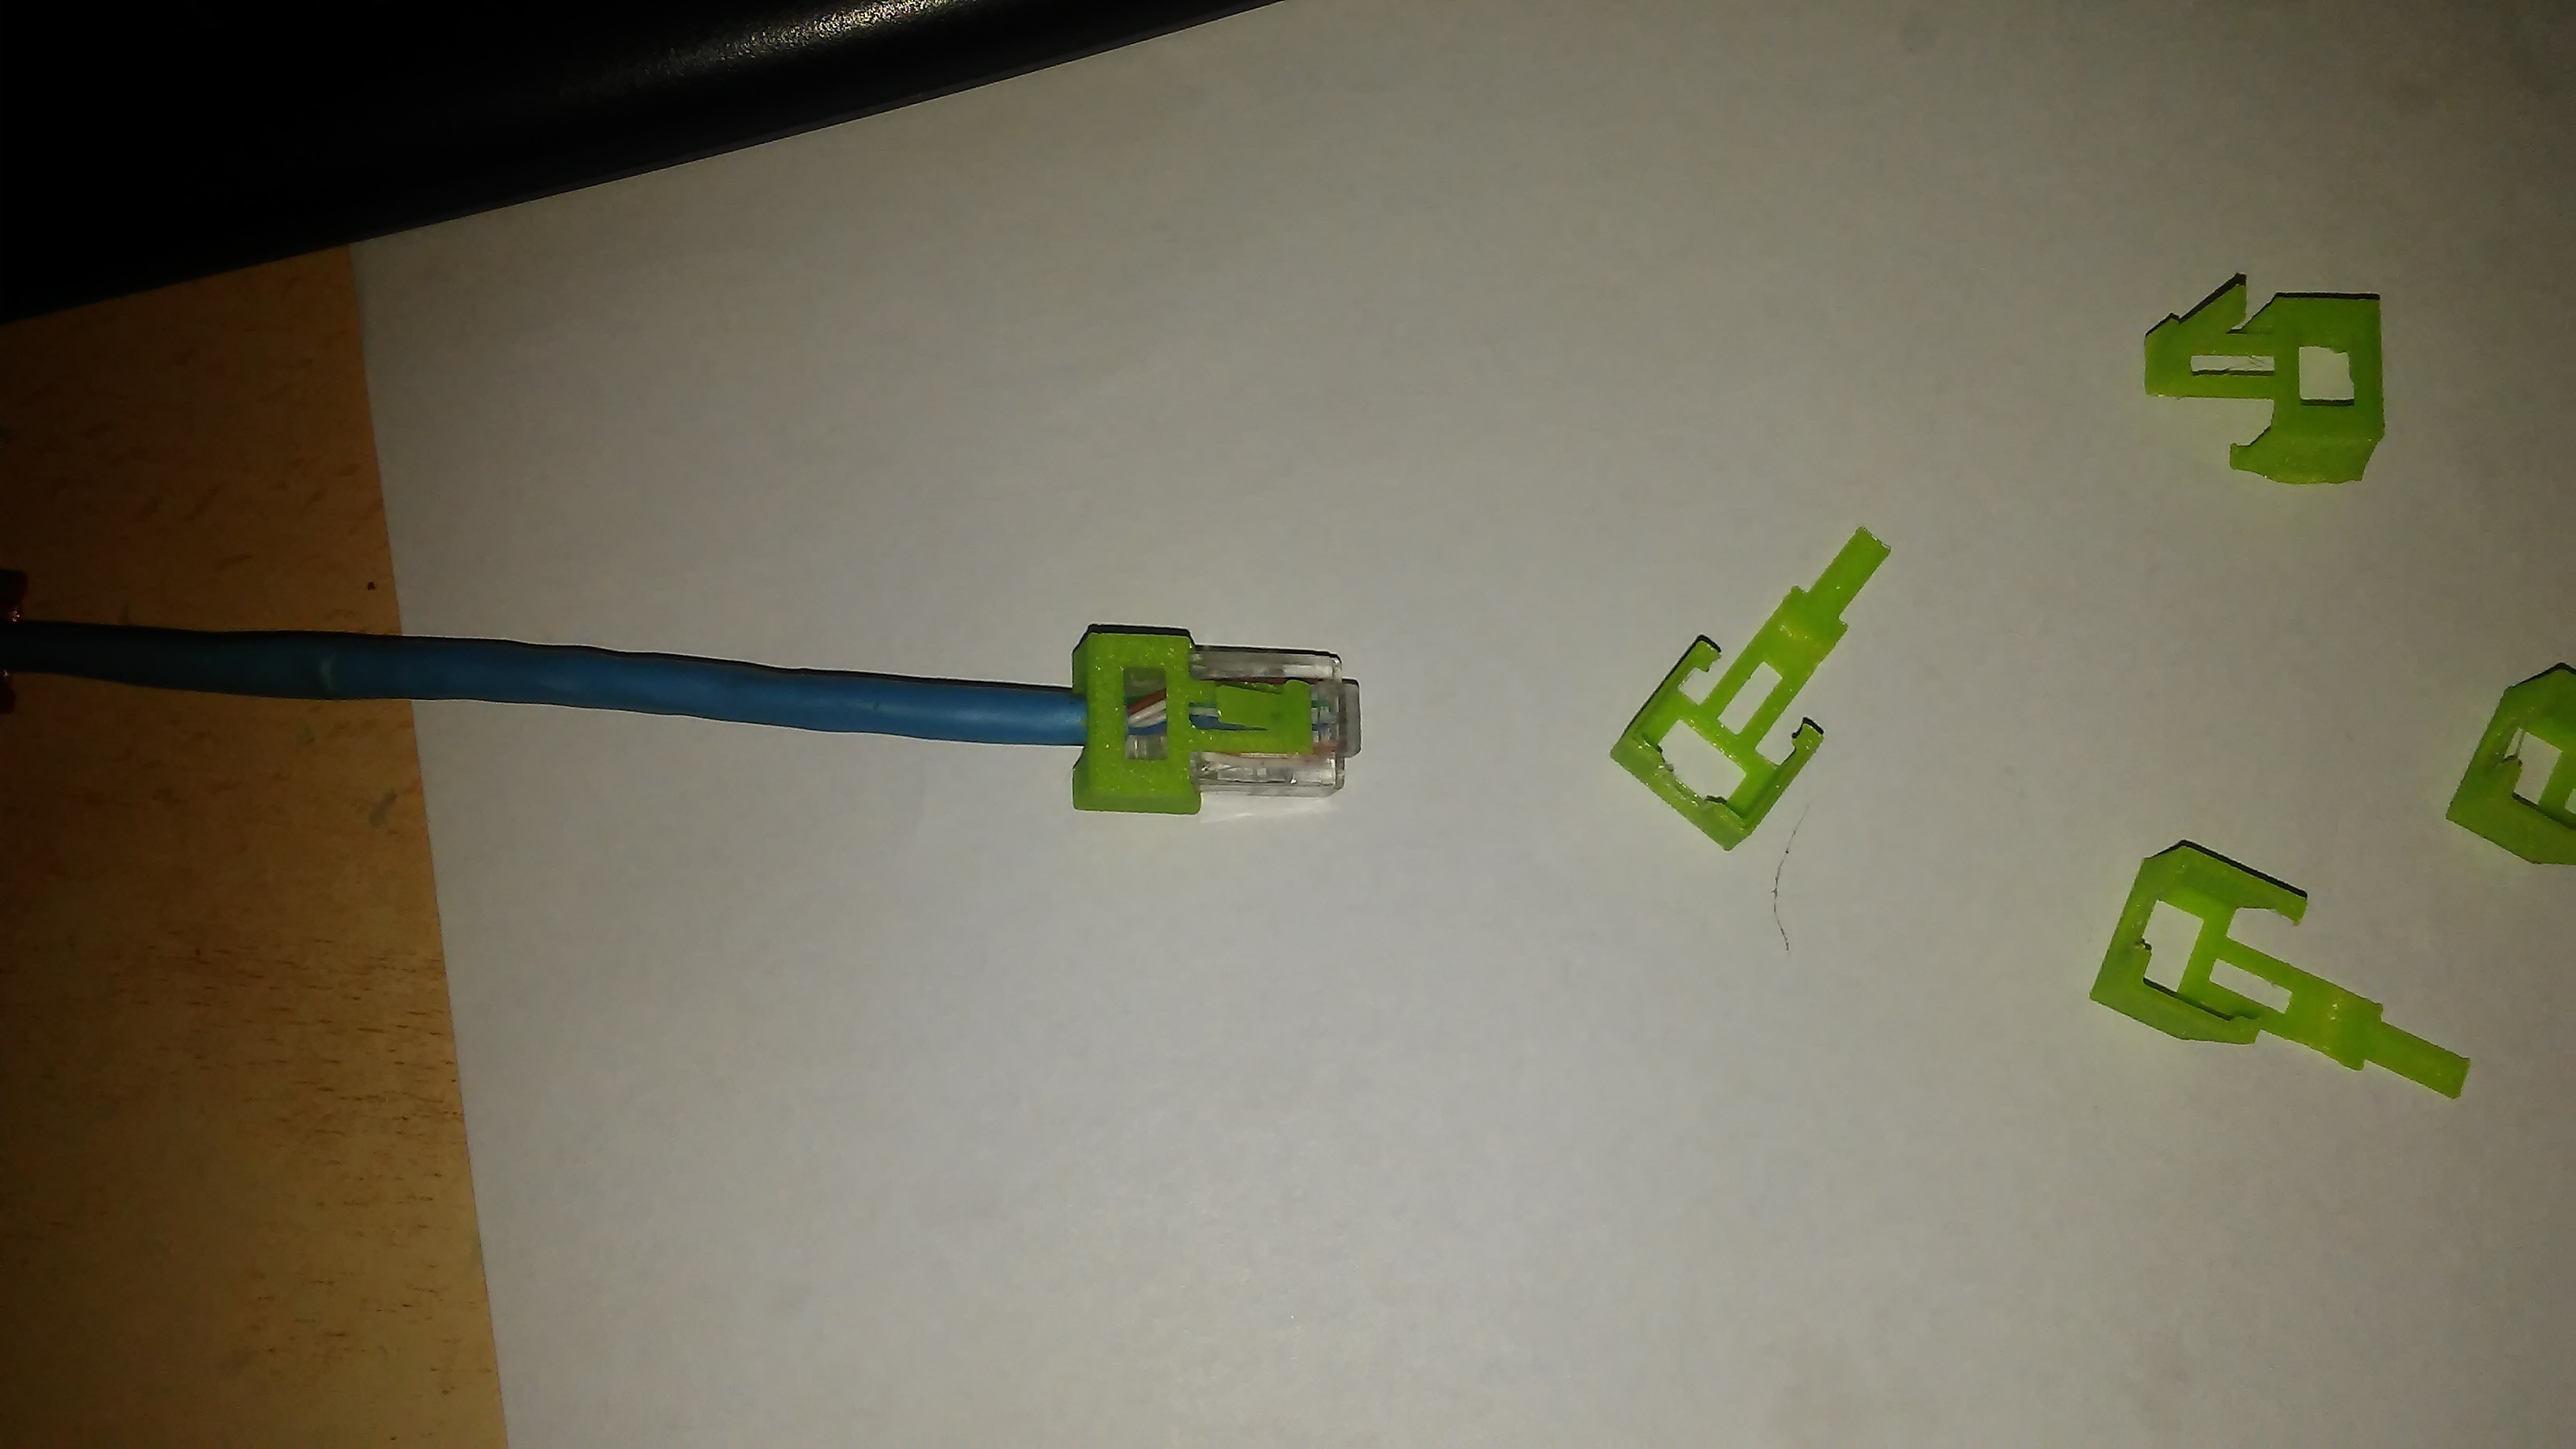 1008181823.jpg Download STL file rj45 broken clip • Template to 3D print, zzzzzcav